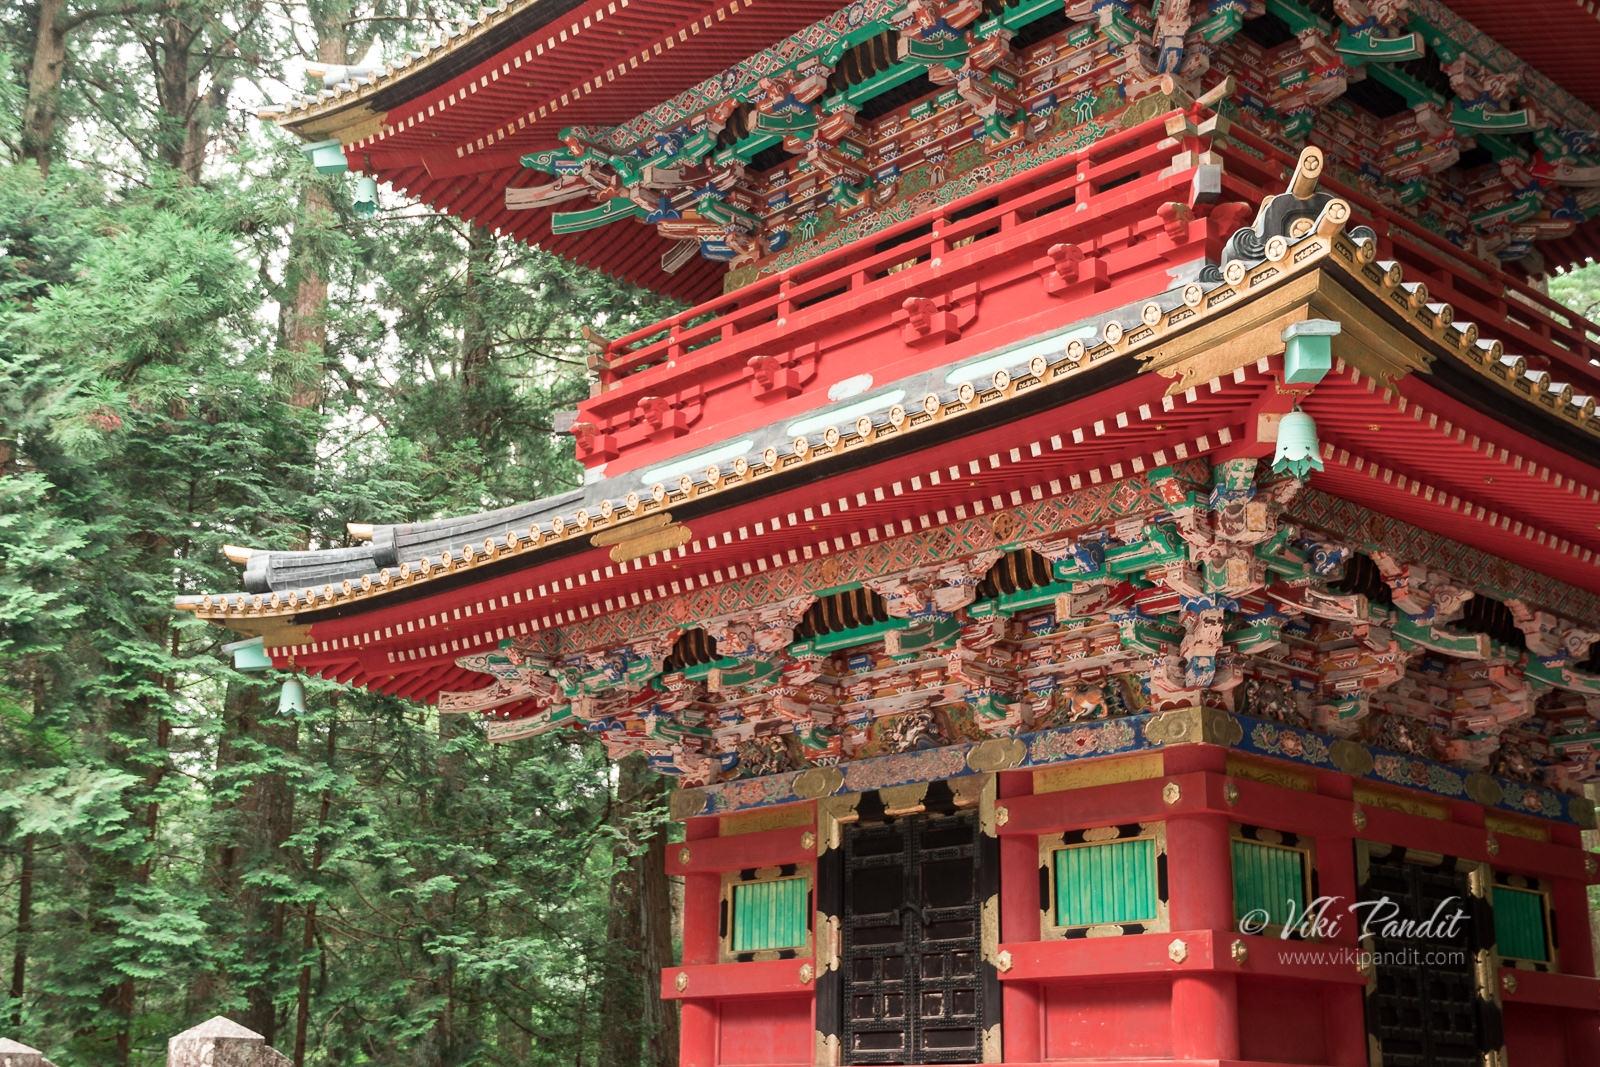 Go-Juu-No-Toh Pagoda